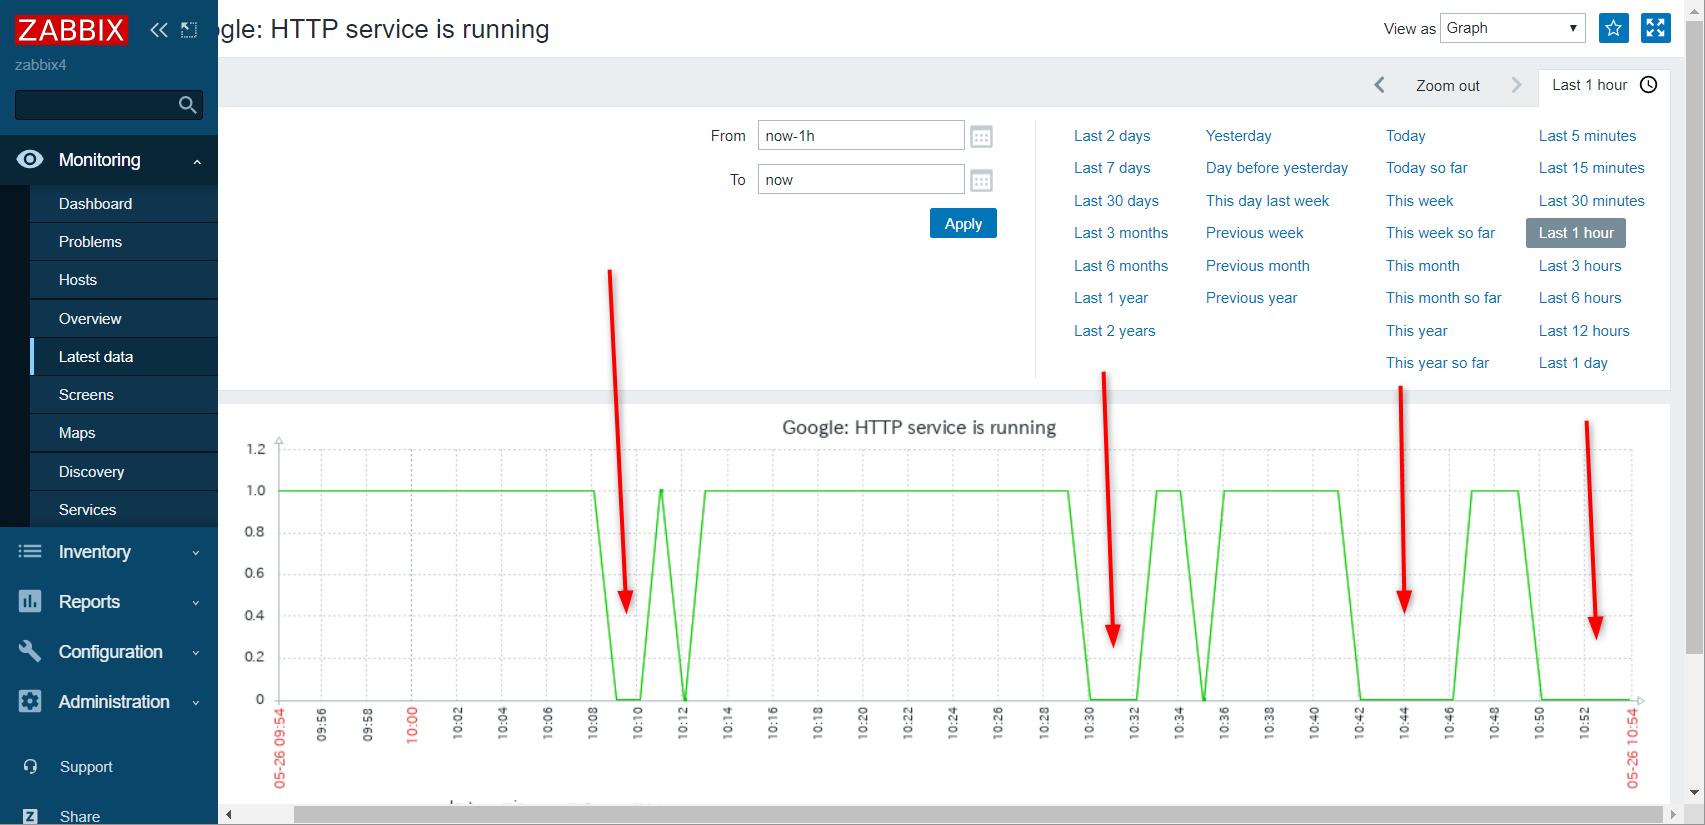 zabbix5 でインターネットの疎通、監視、リモートワーク時代の「ネットが遅い」をチェック_a0056607_12242658.png